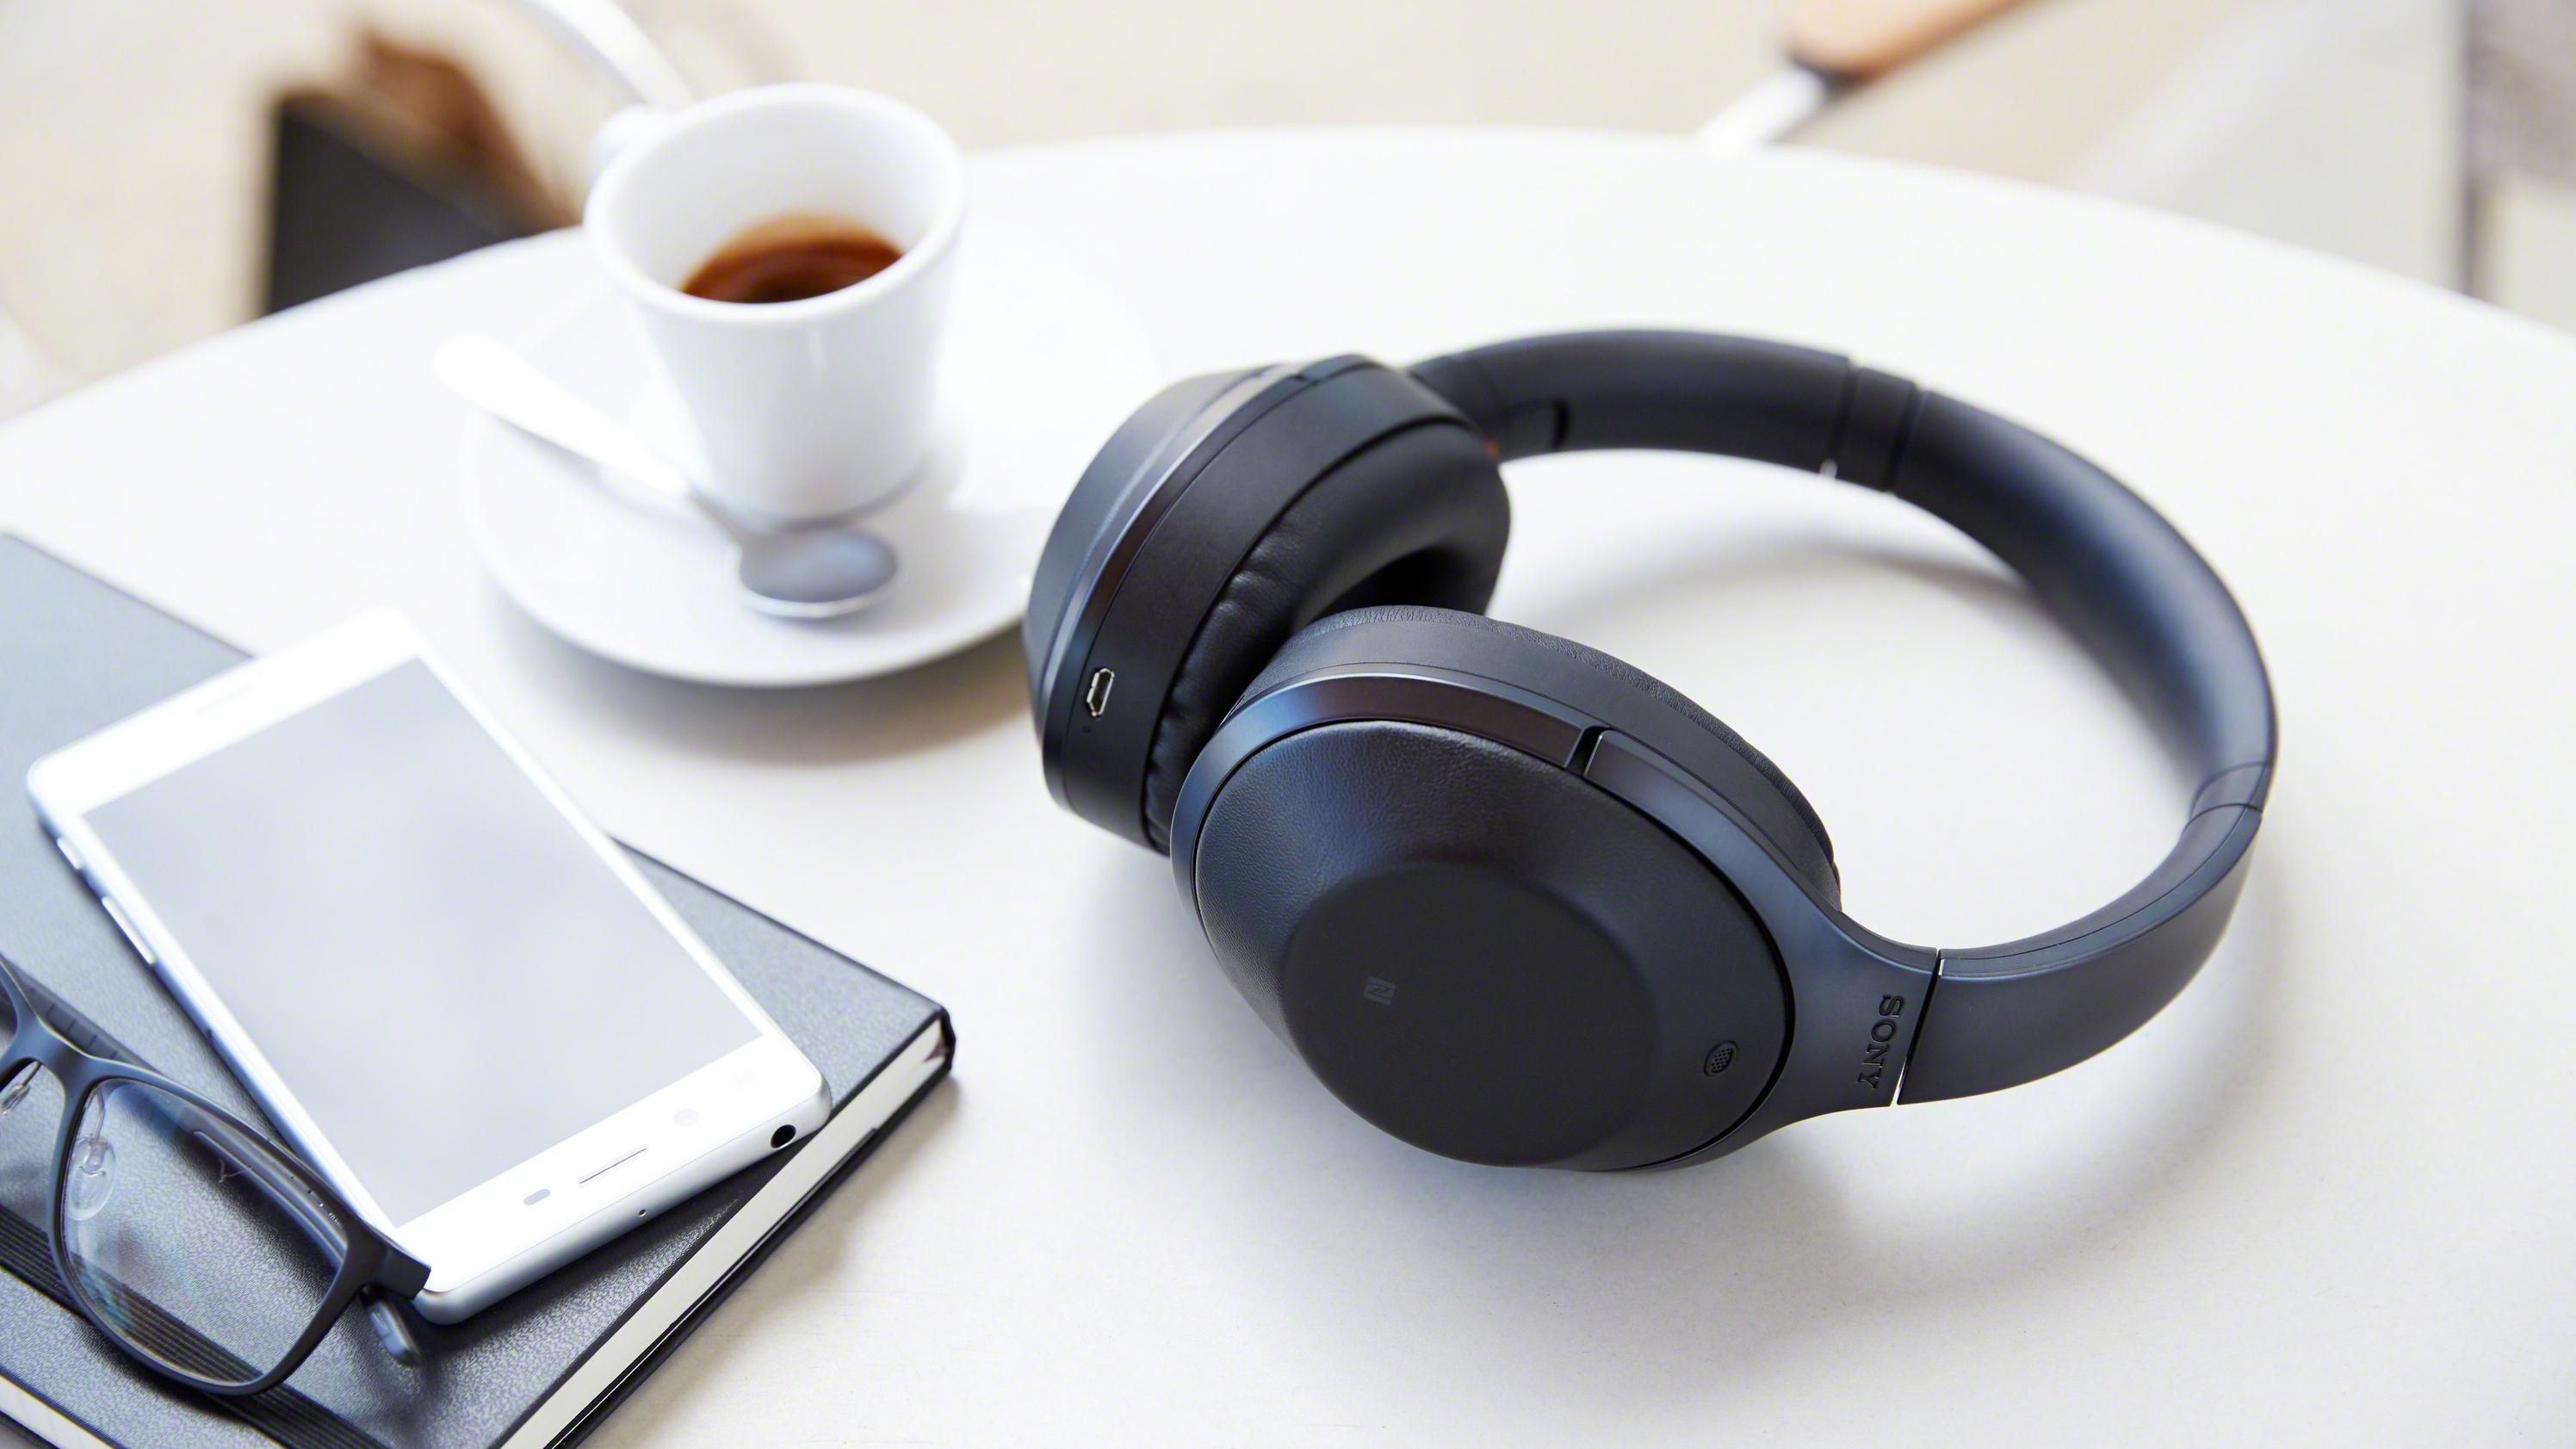 Sony Mdr 1000x Wireless Headphones Review Techradar Usb Dac Headphone Amp With Easy To Use Digital Volume Control Ebay